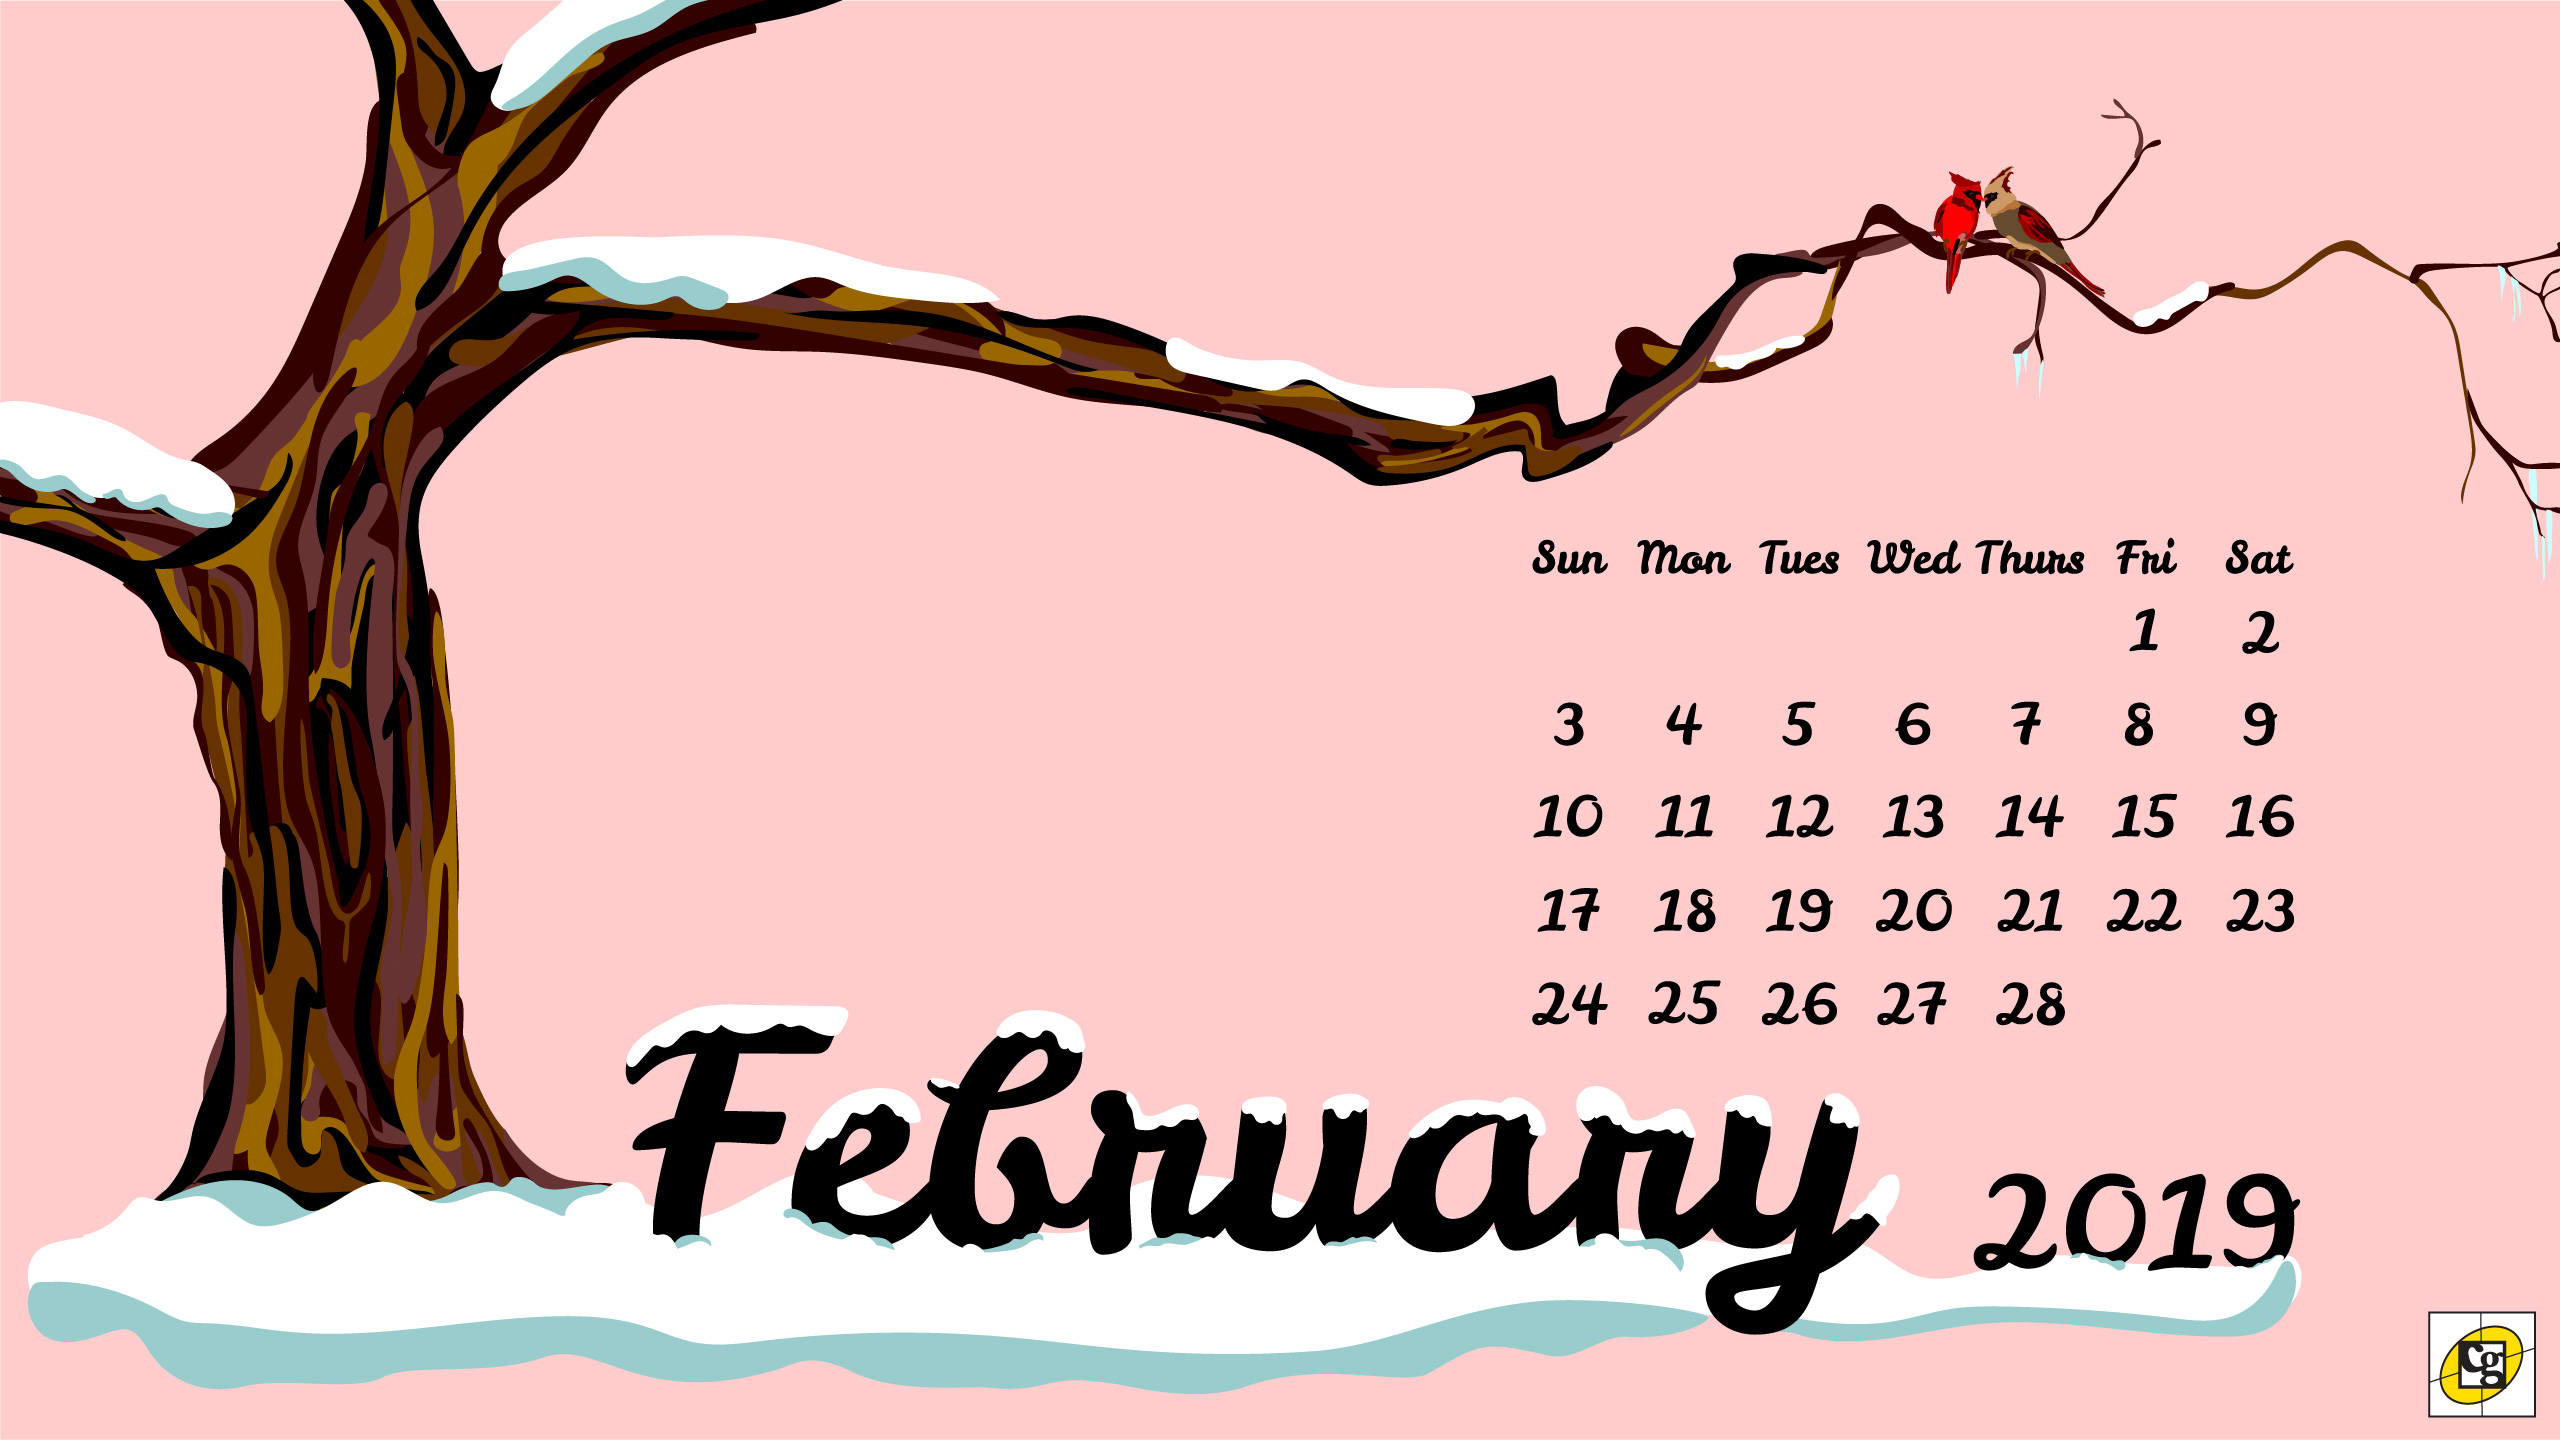 Free Download February 2019 Desktop Calendar Composure Graphics Composure Graphics